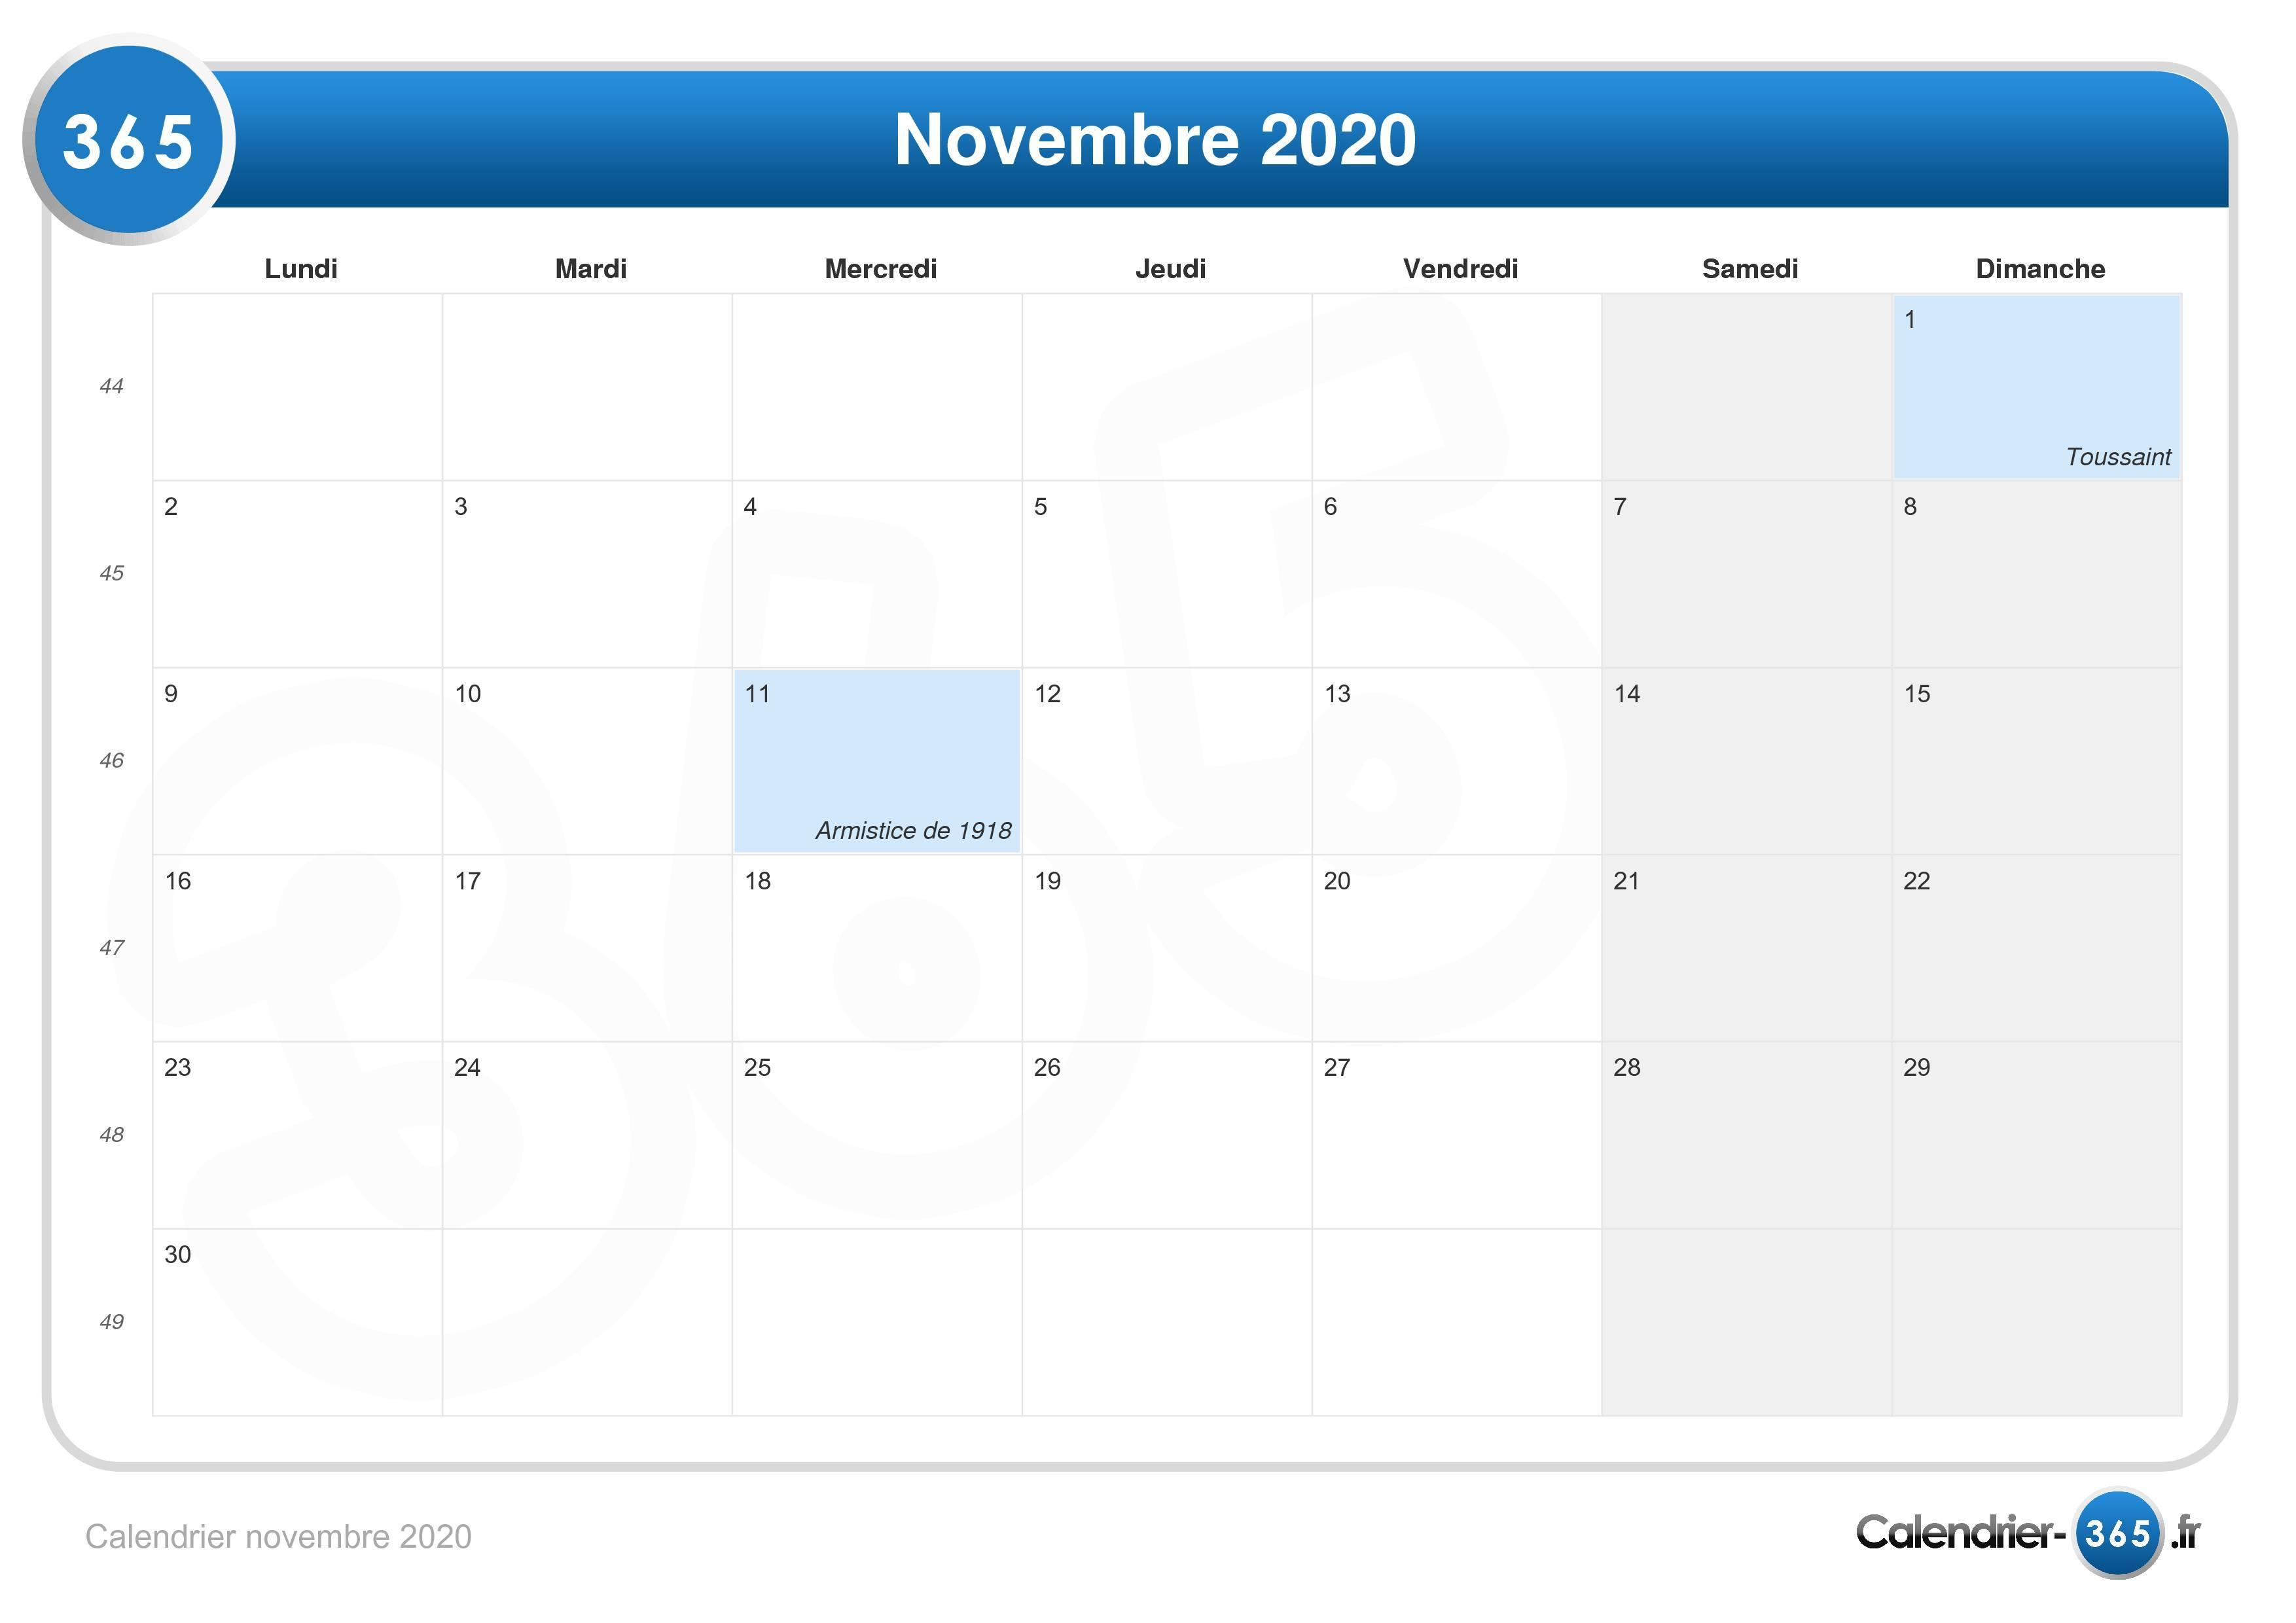 Calendrier Novembre 2020.Calendrier Novembre 2020